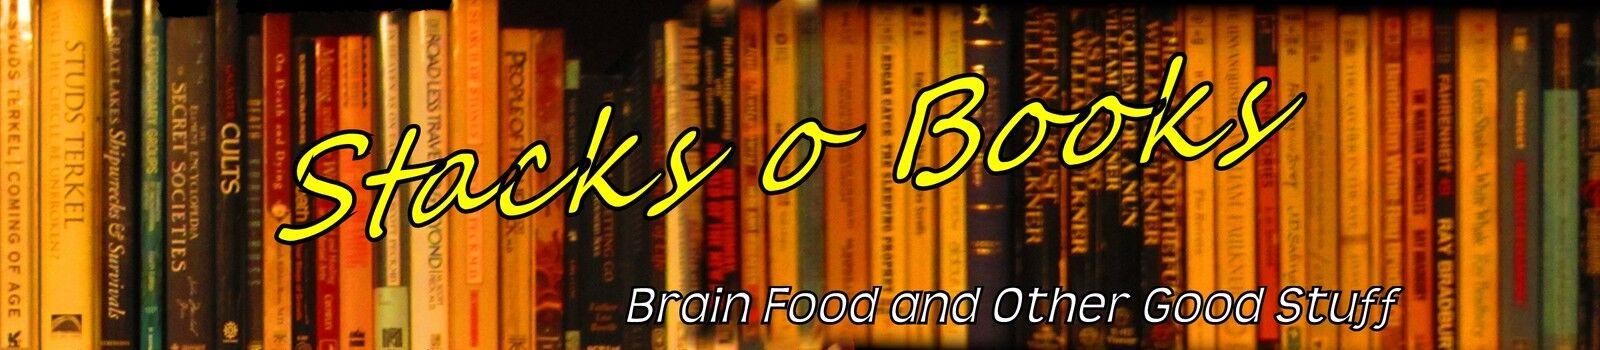 Stacks o Books